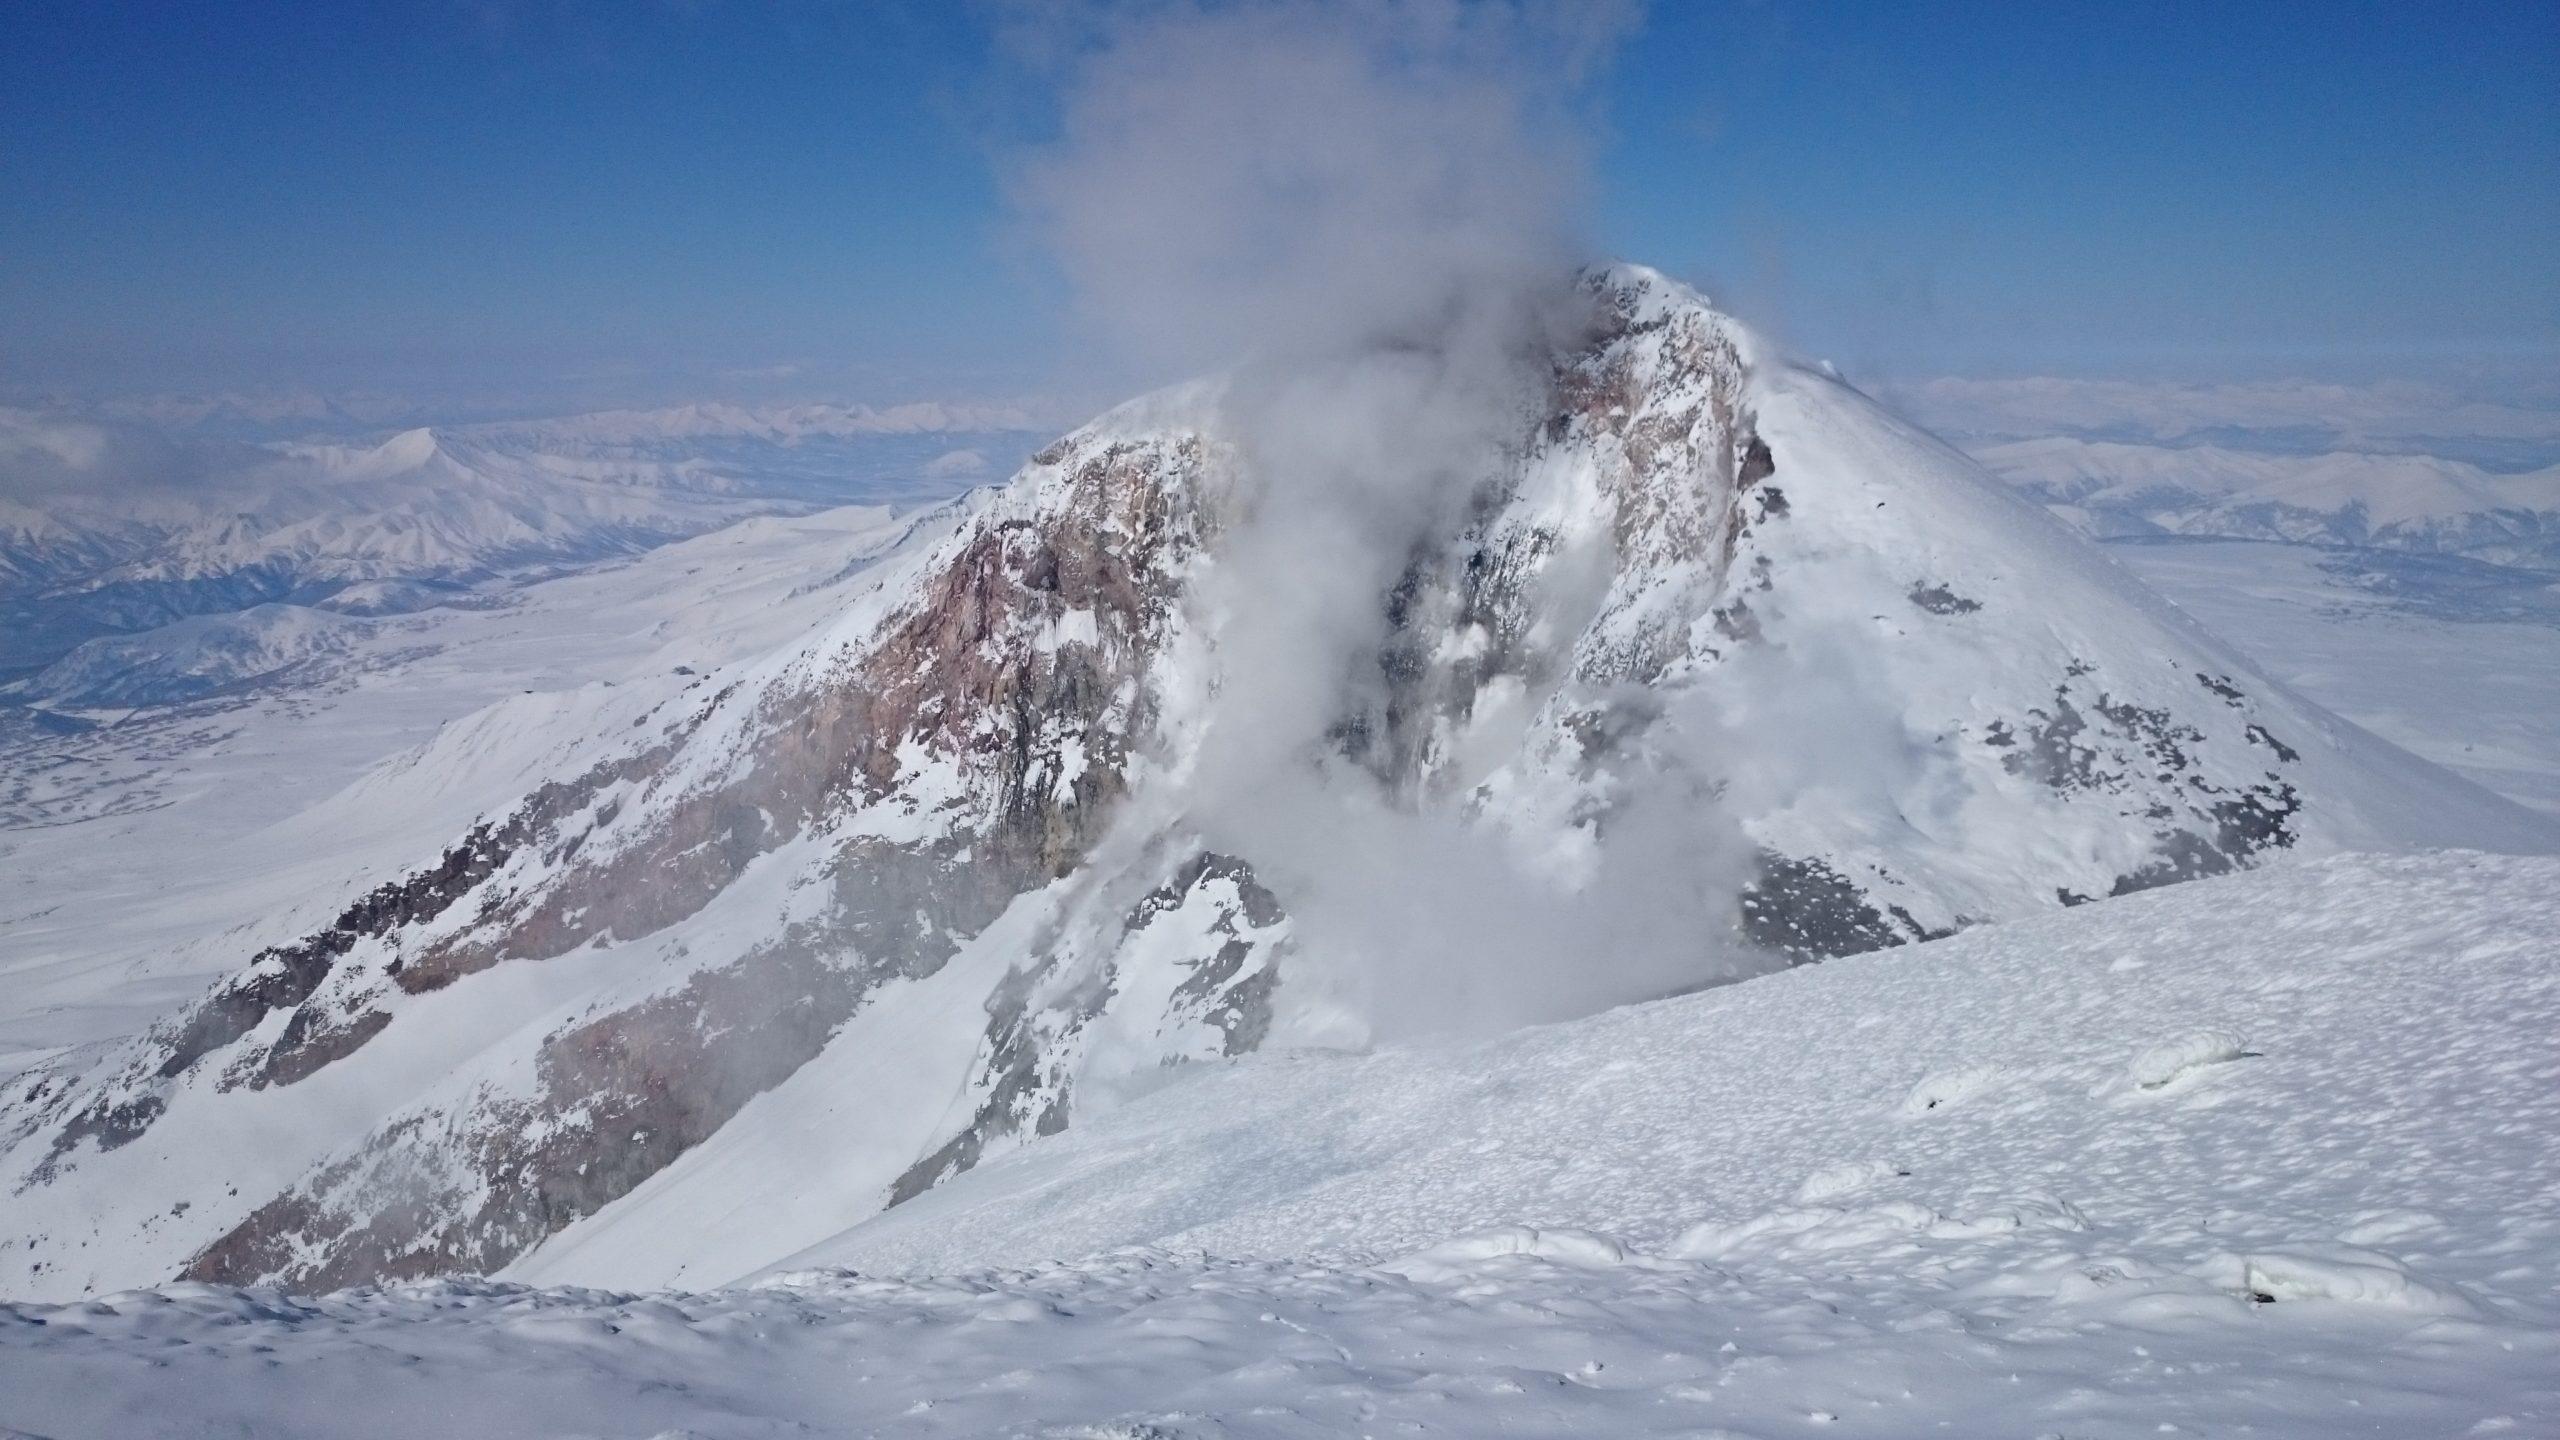 Tchoukotka-Kamchatka-La-Datcha-Heliski-Russia-2-scaled